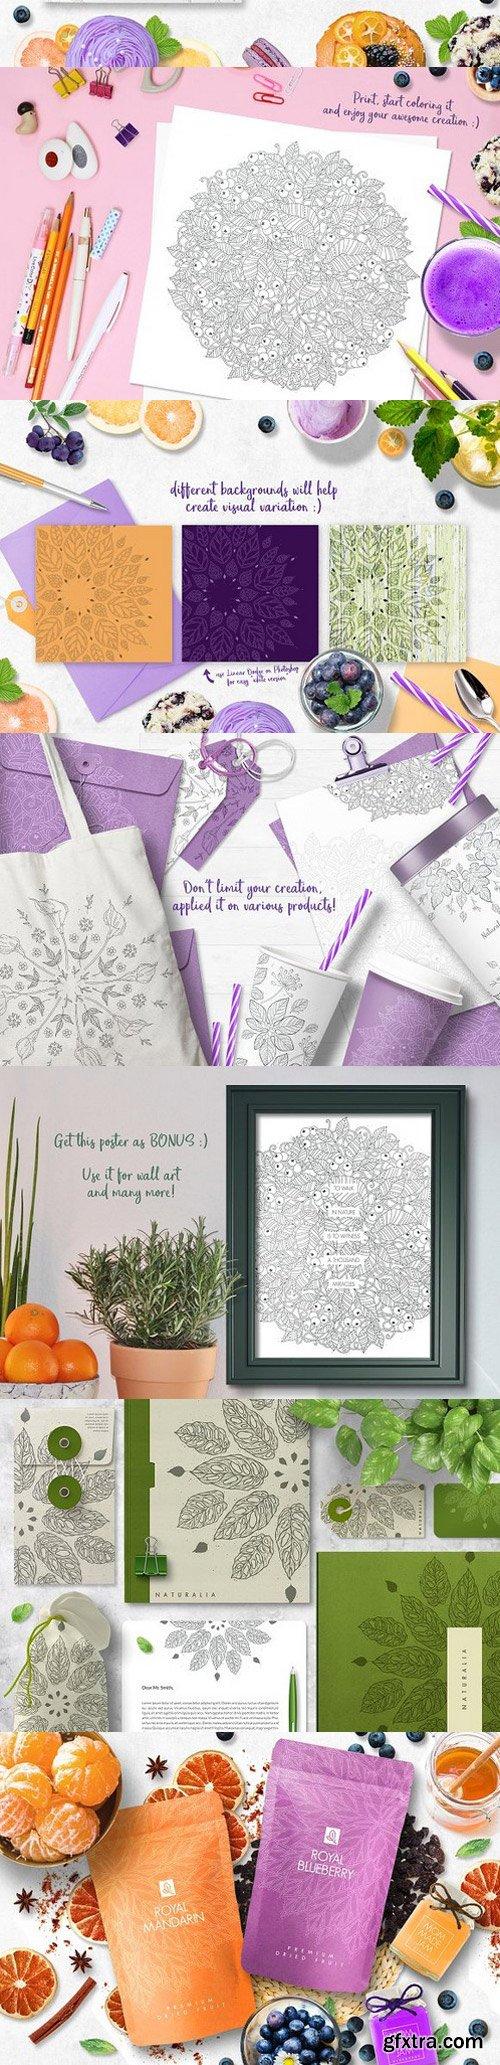 Sea of Dandelions Part 3